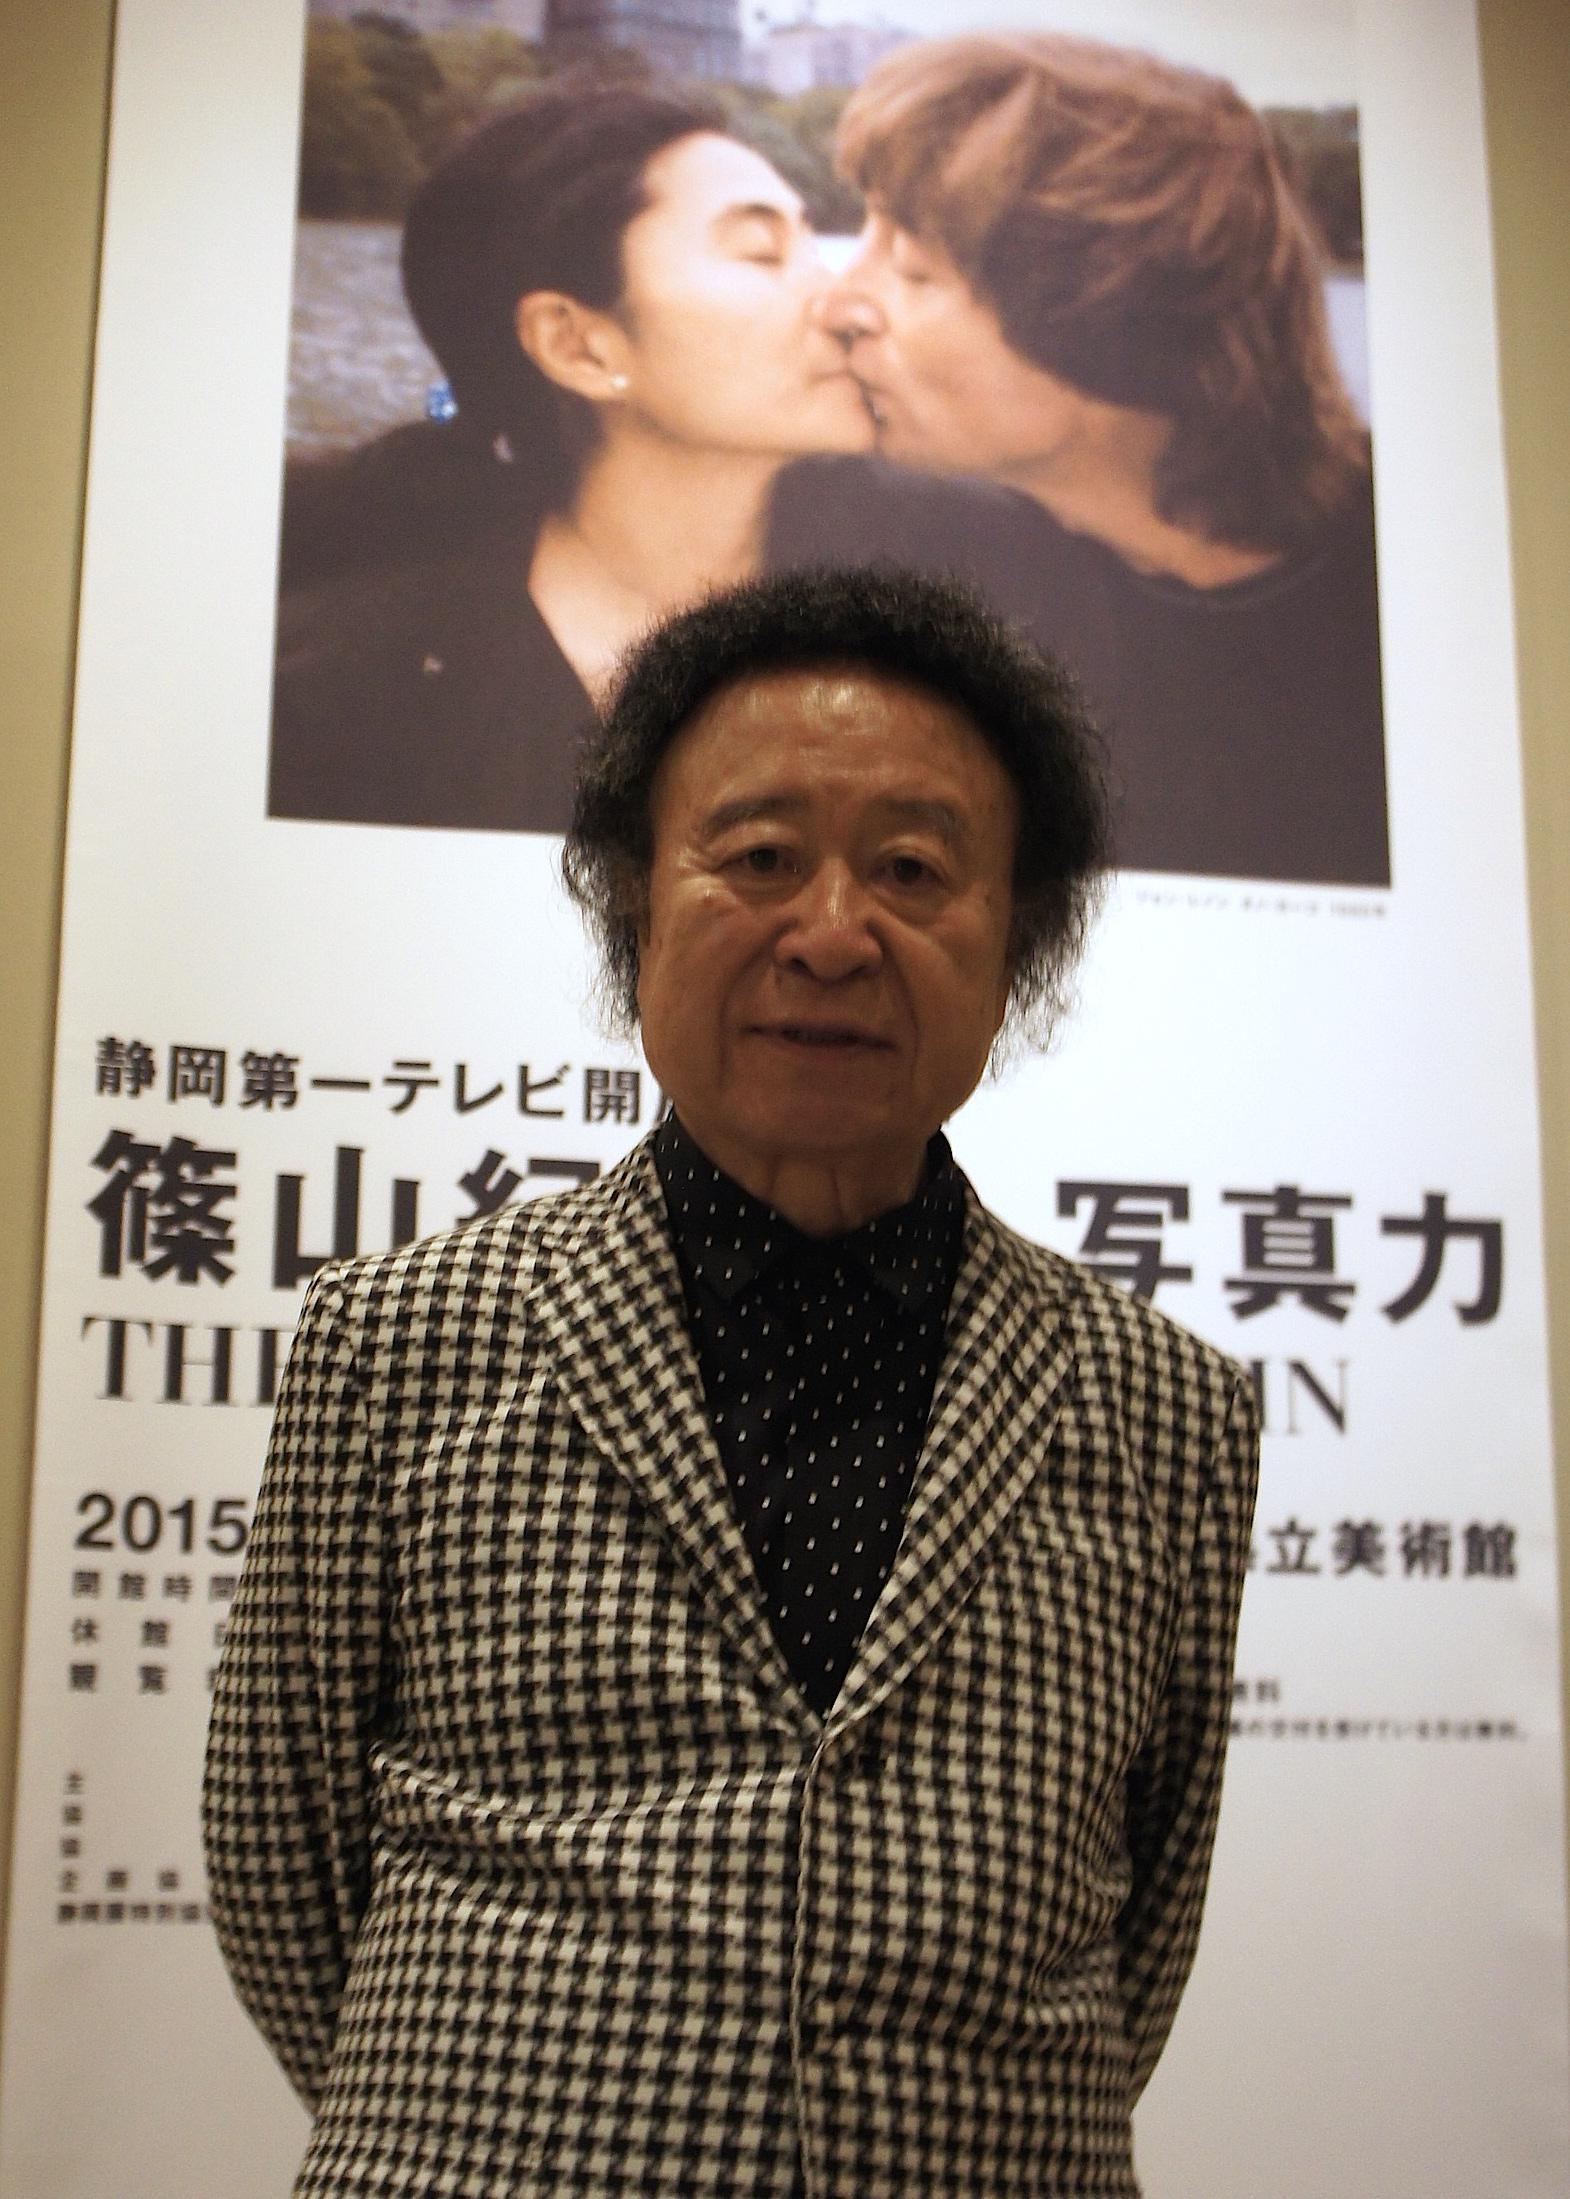 Image of Kishin Shinoyama from Wikidata